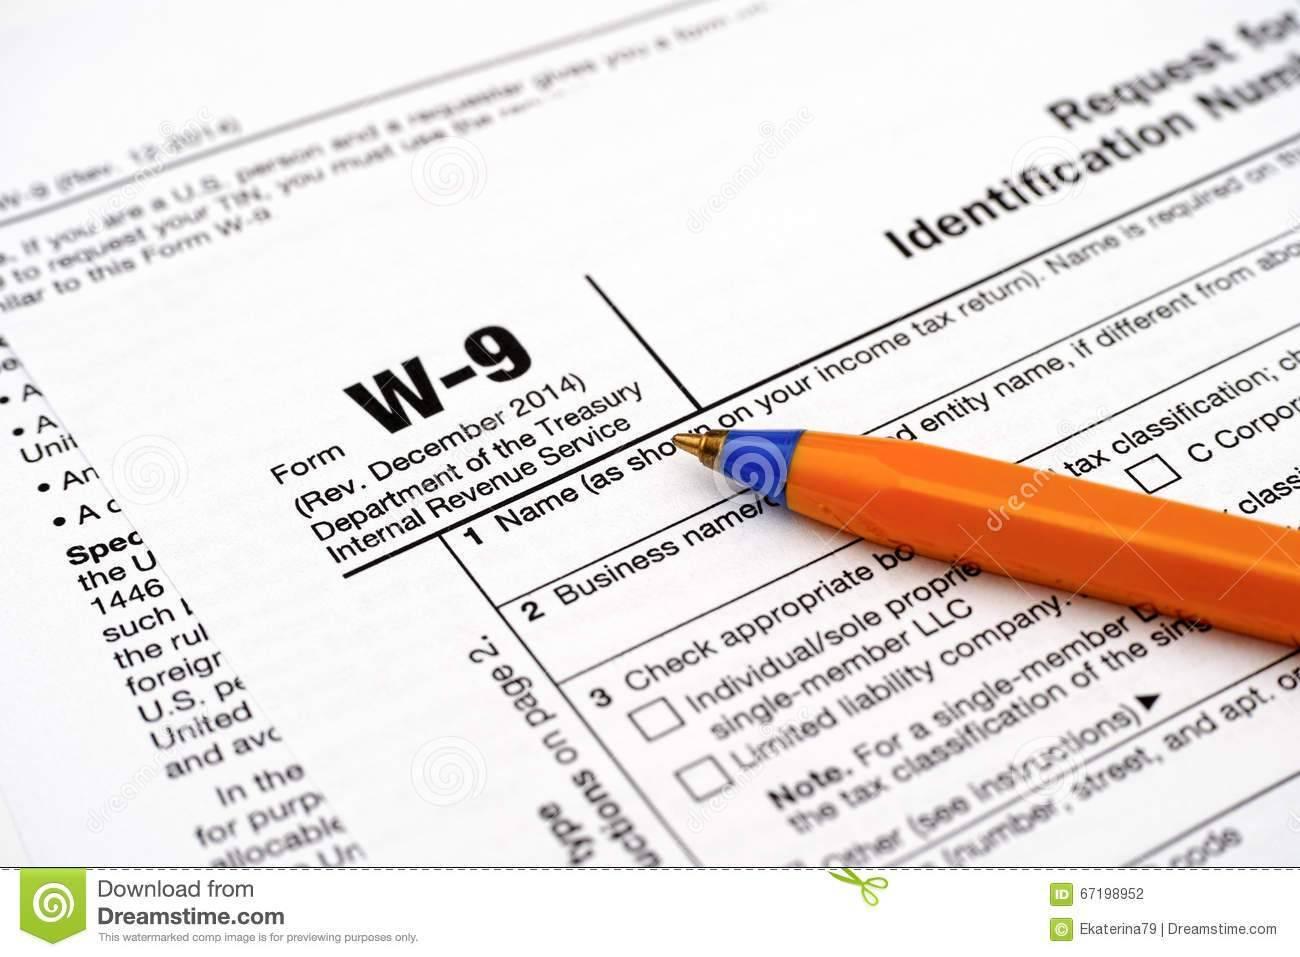 Llc Subscription Agreement Form